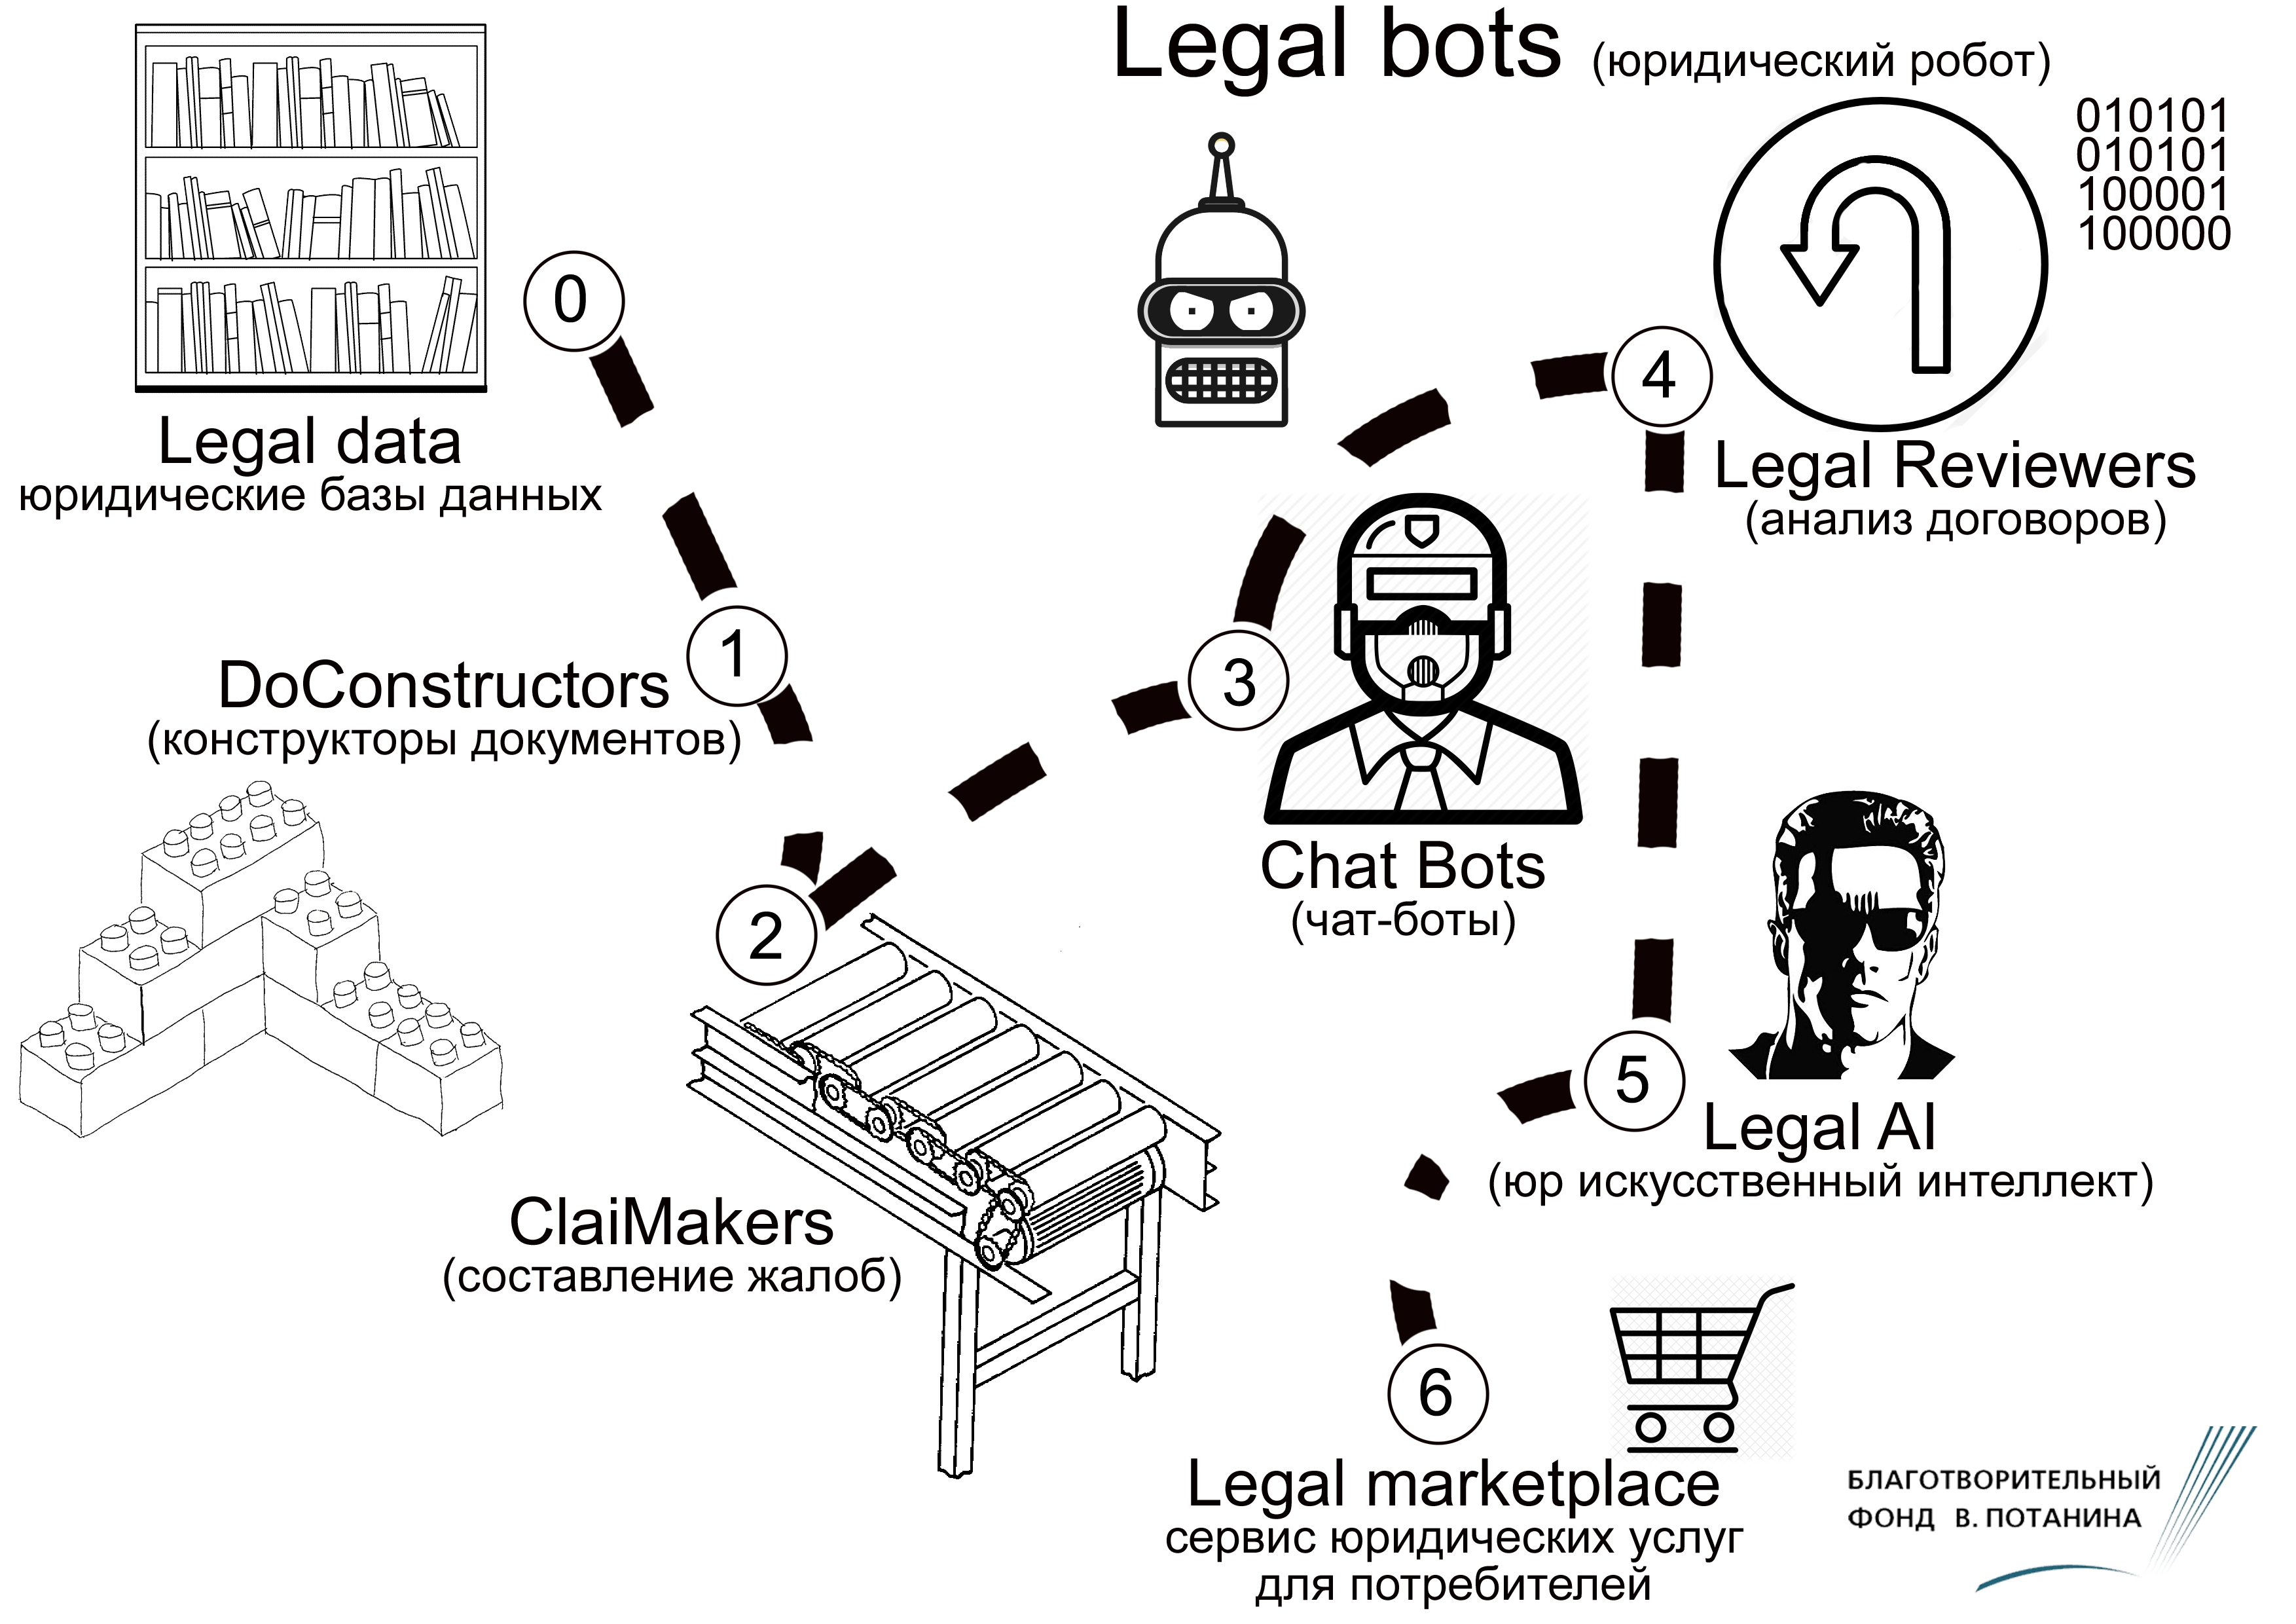 legal bots